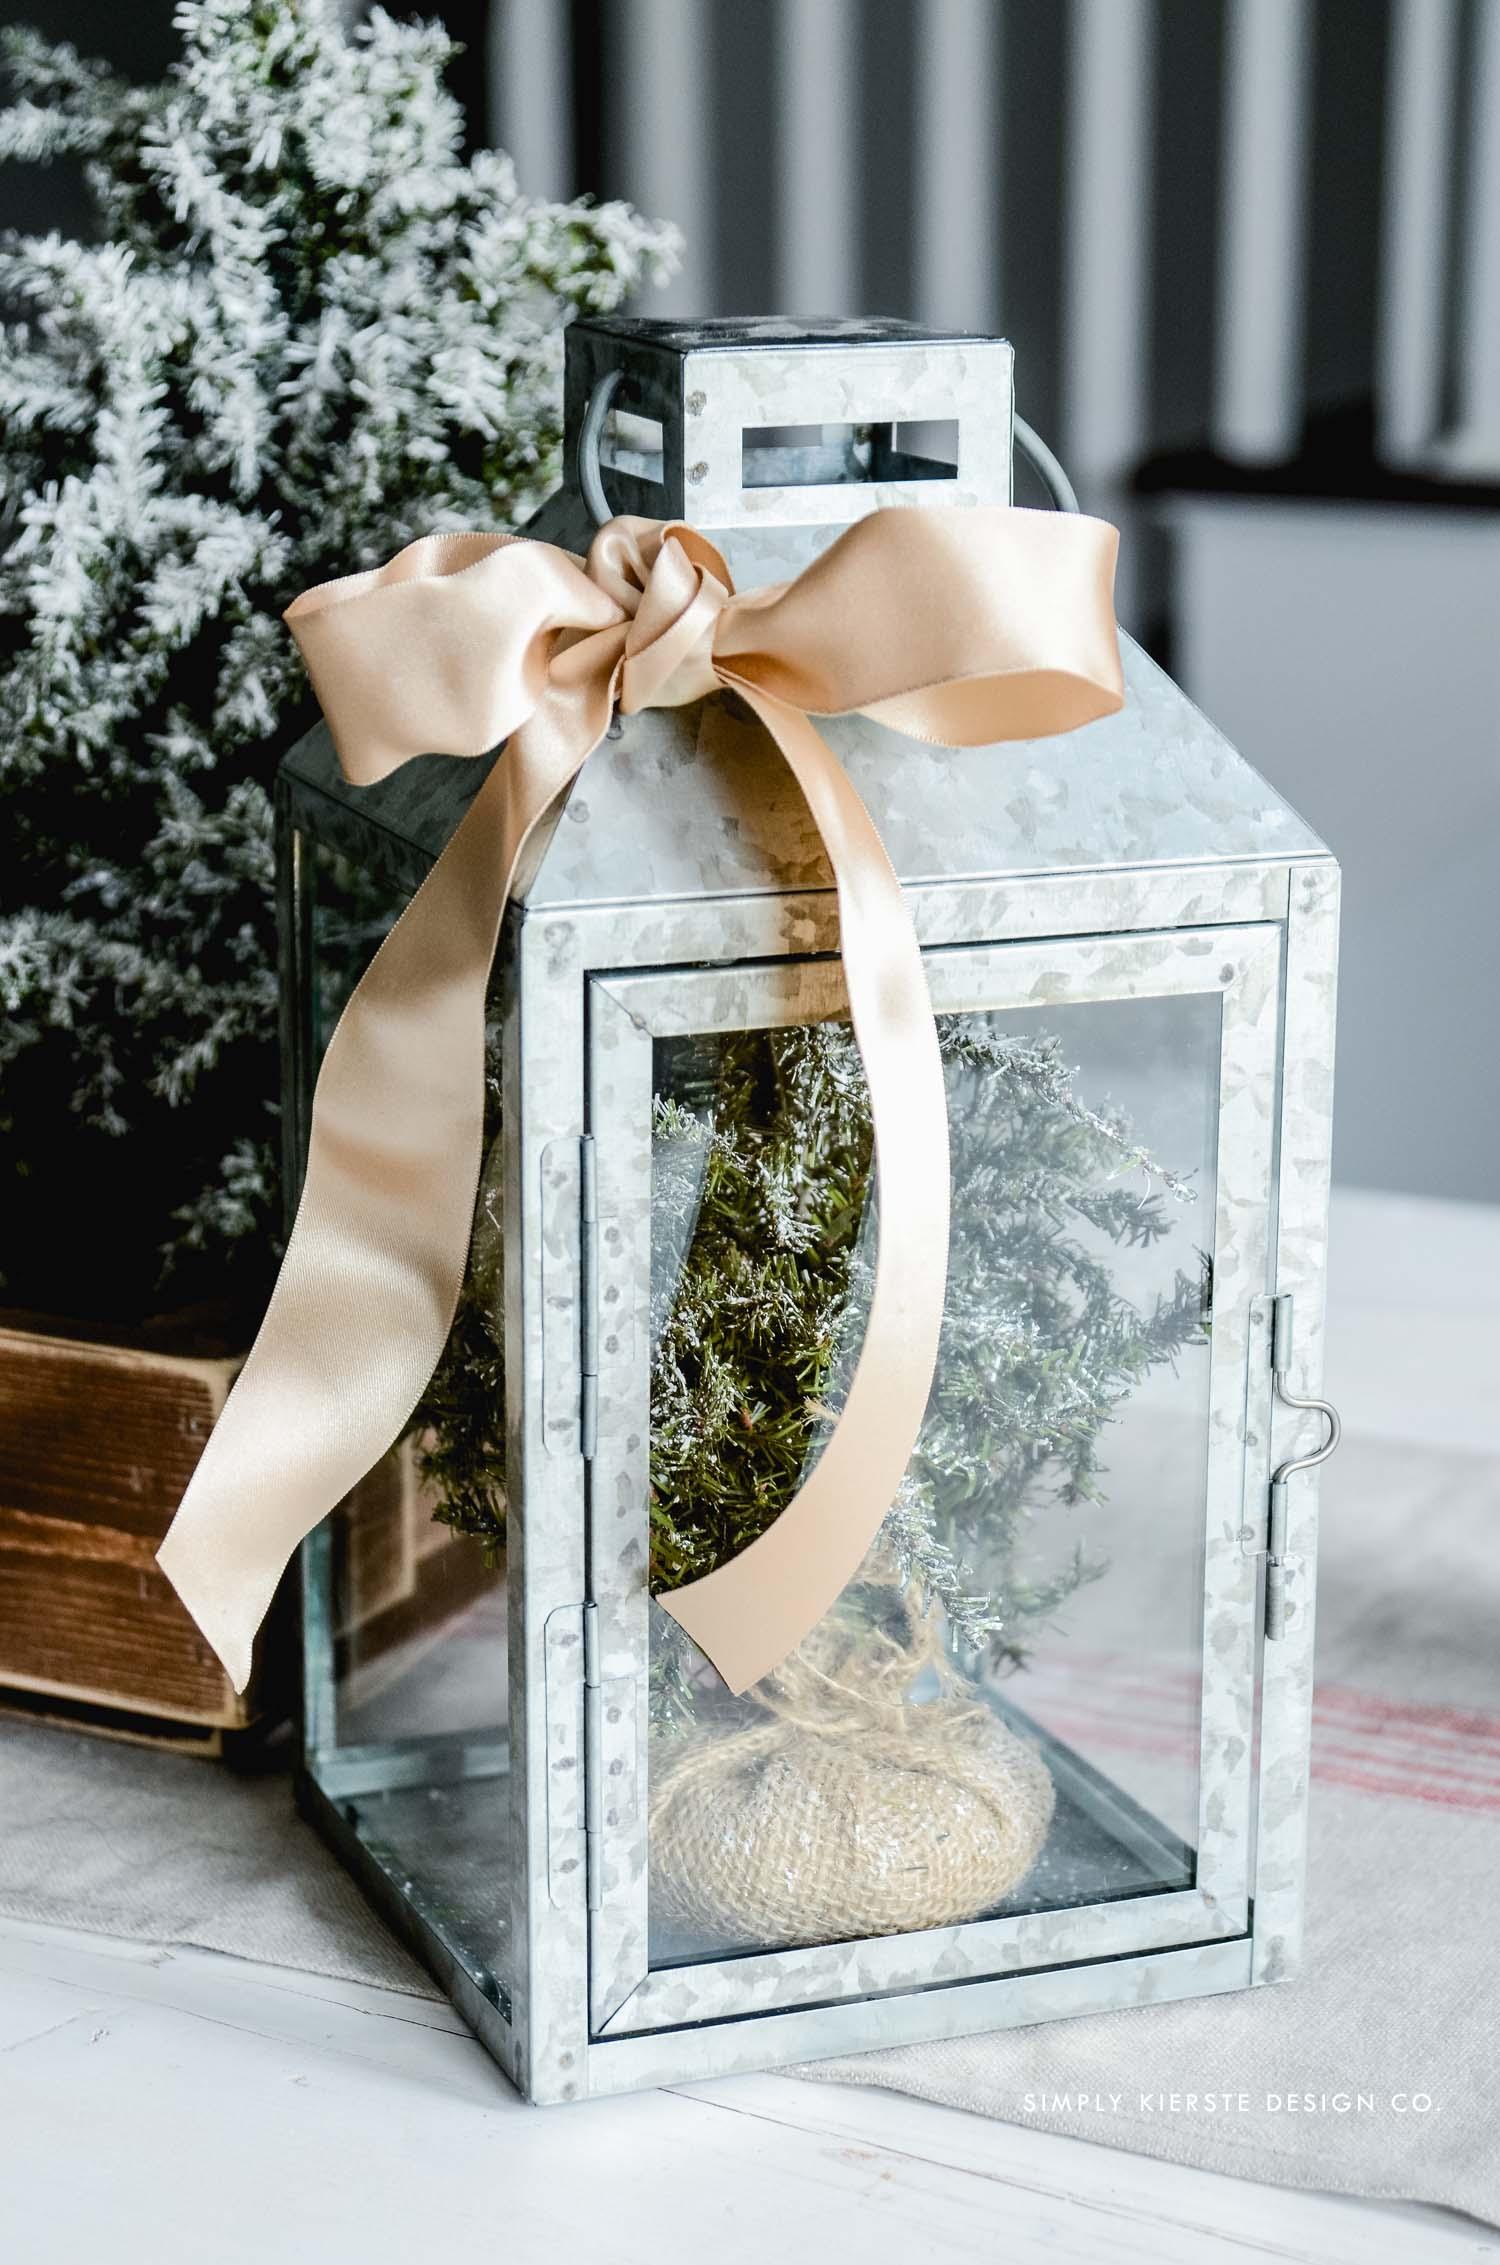 Affordable Gift Ideas | Galvanized Lantern | oldsaltfarm.com